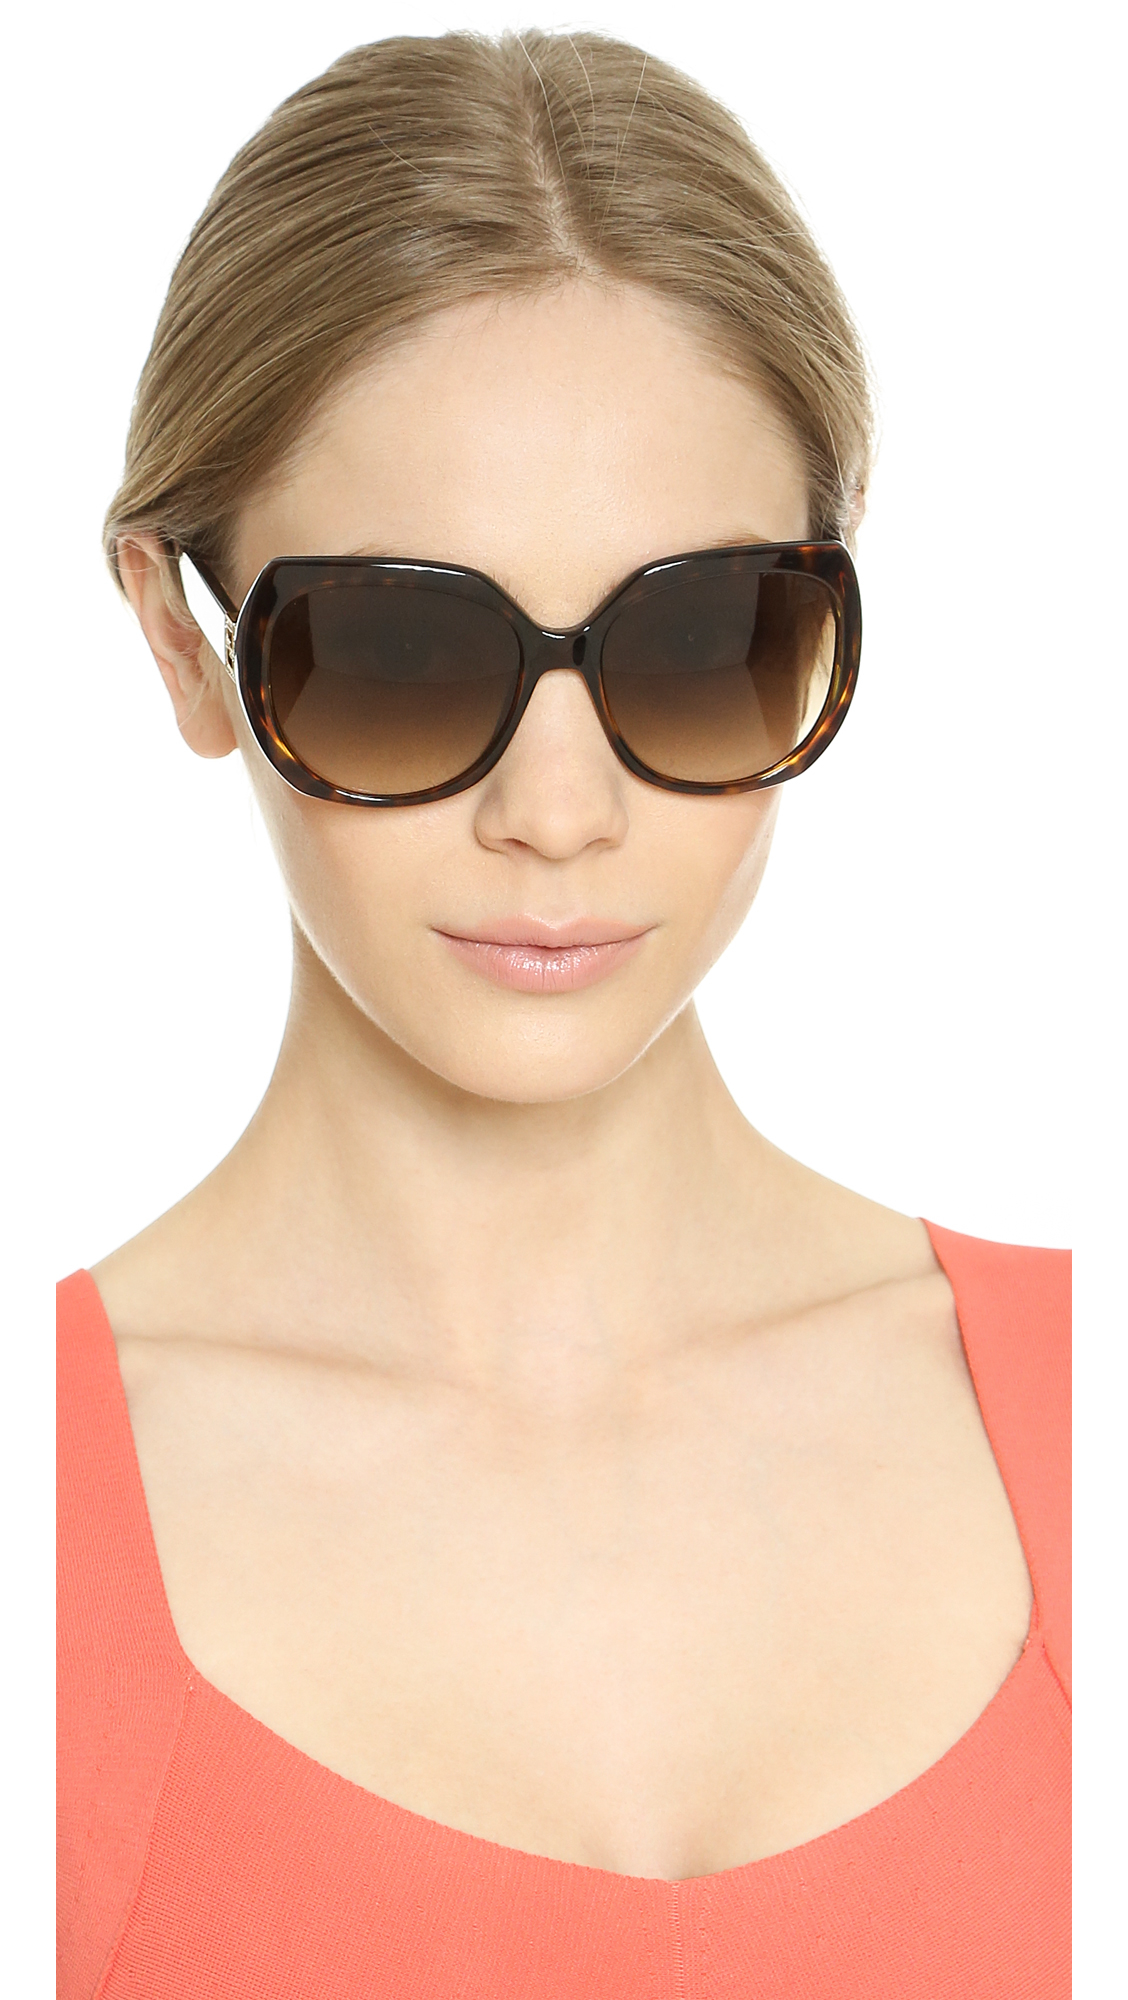 03209e4b0ad Lyst - Fendi Glam Sunglasses - Havana brown Gradient in Brown